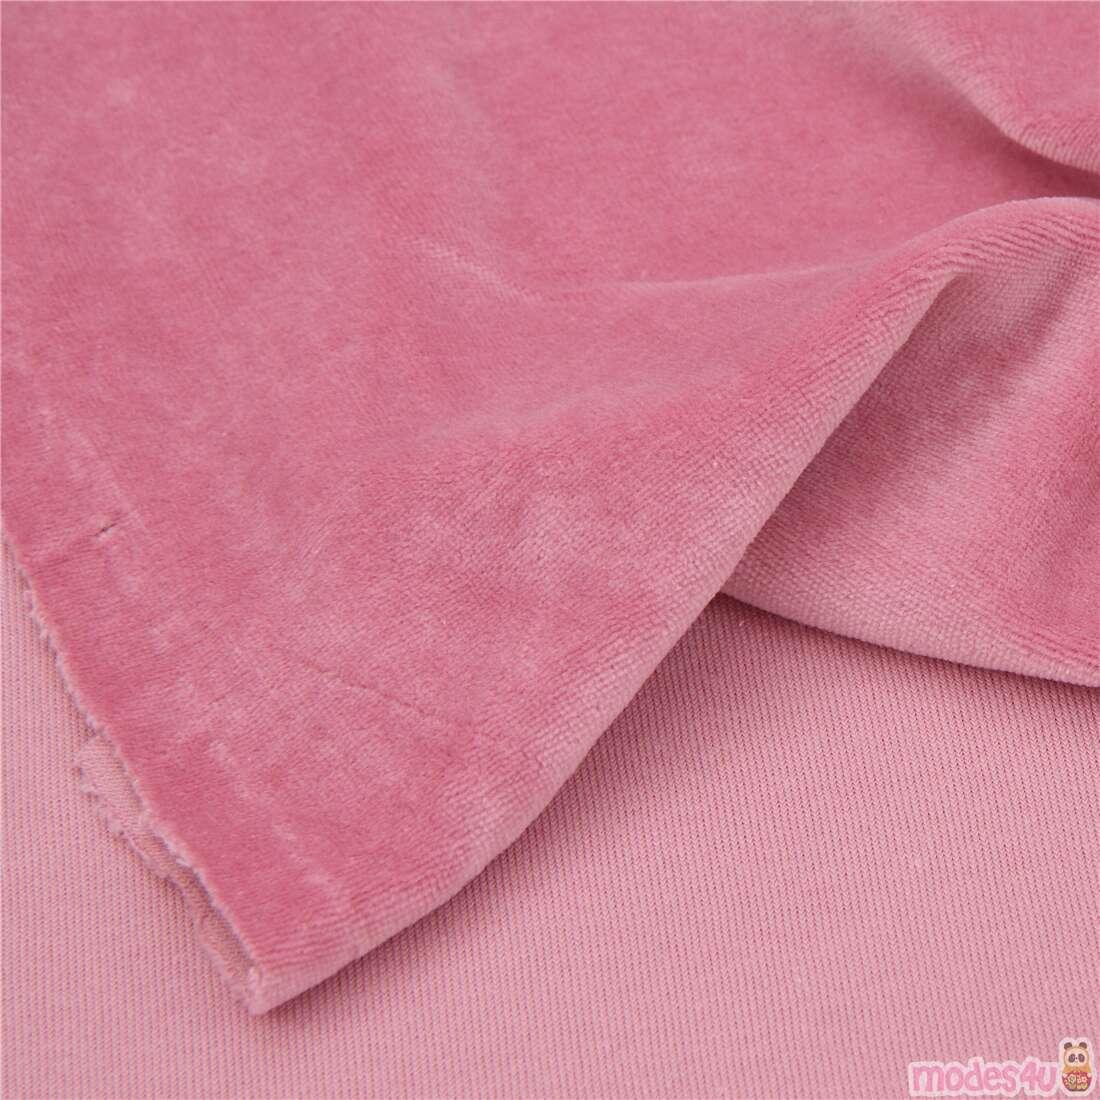 METRE Alexander Henry Skulls Stretch Cotton Jersey Dressmaking Fabric Pink